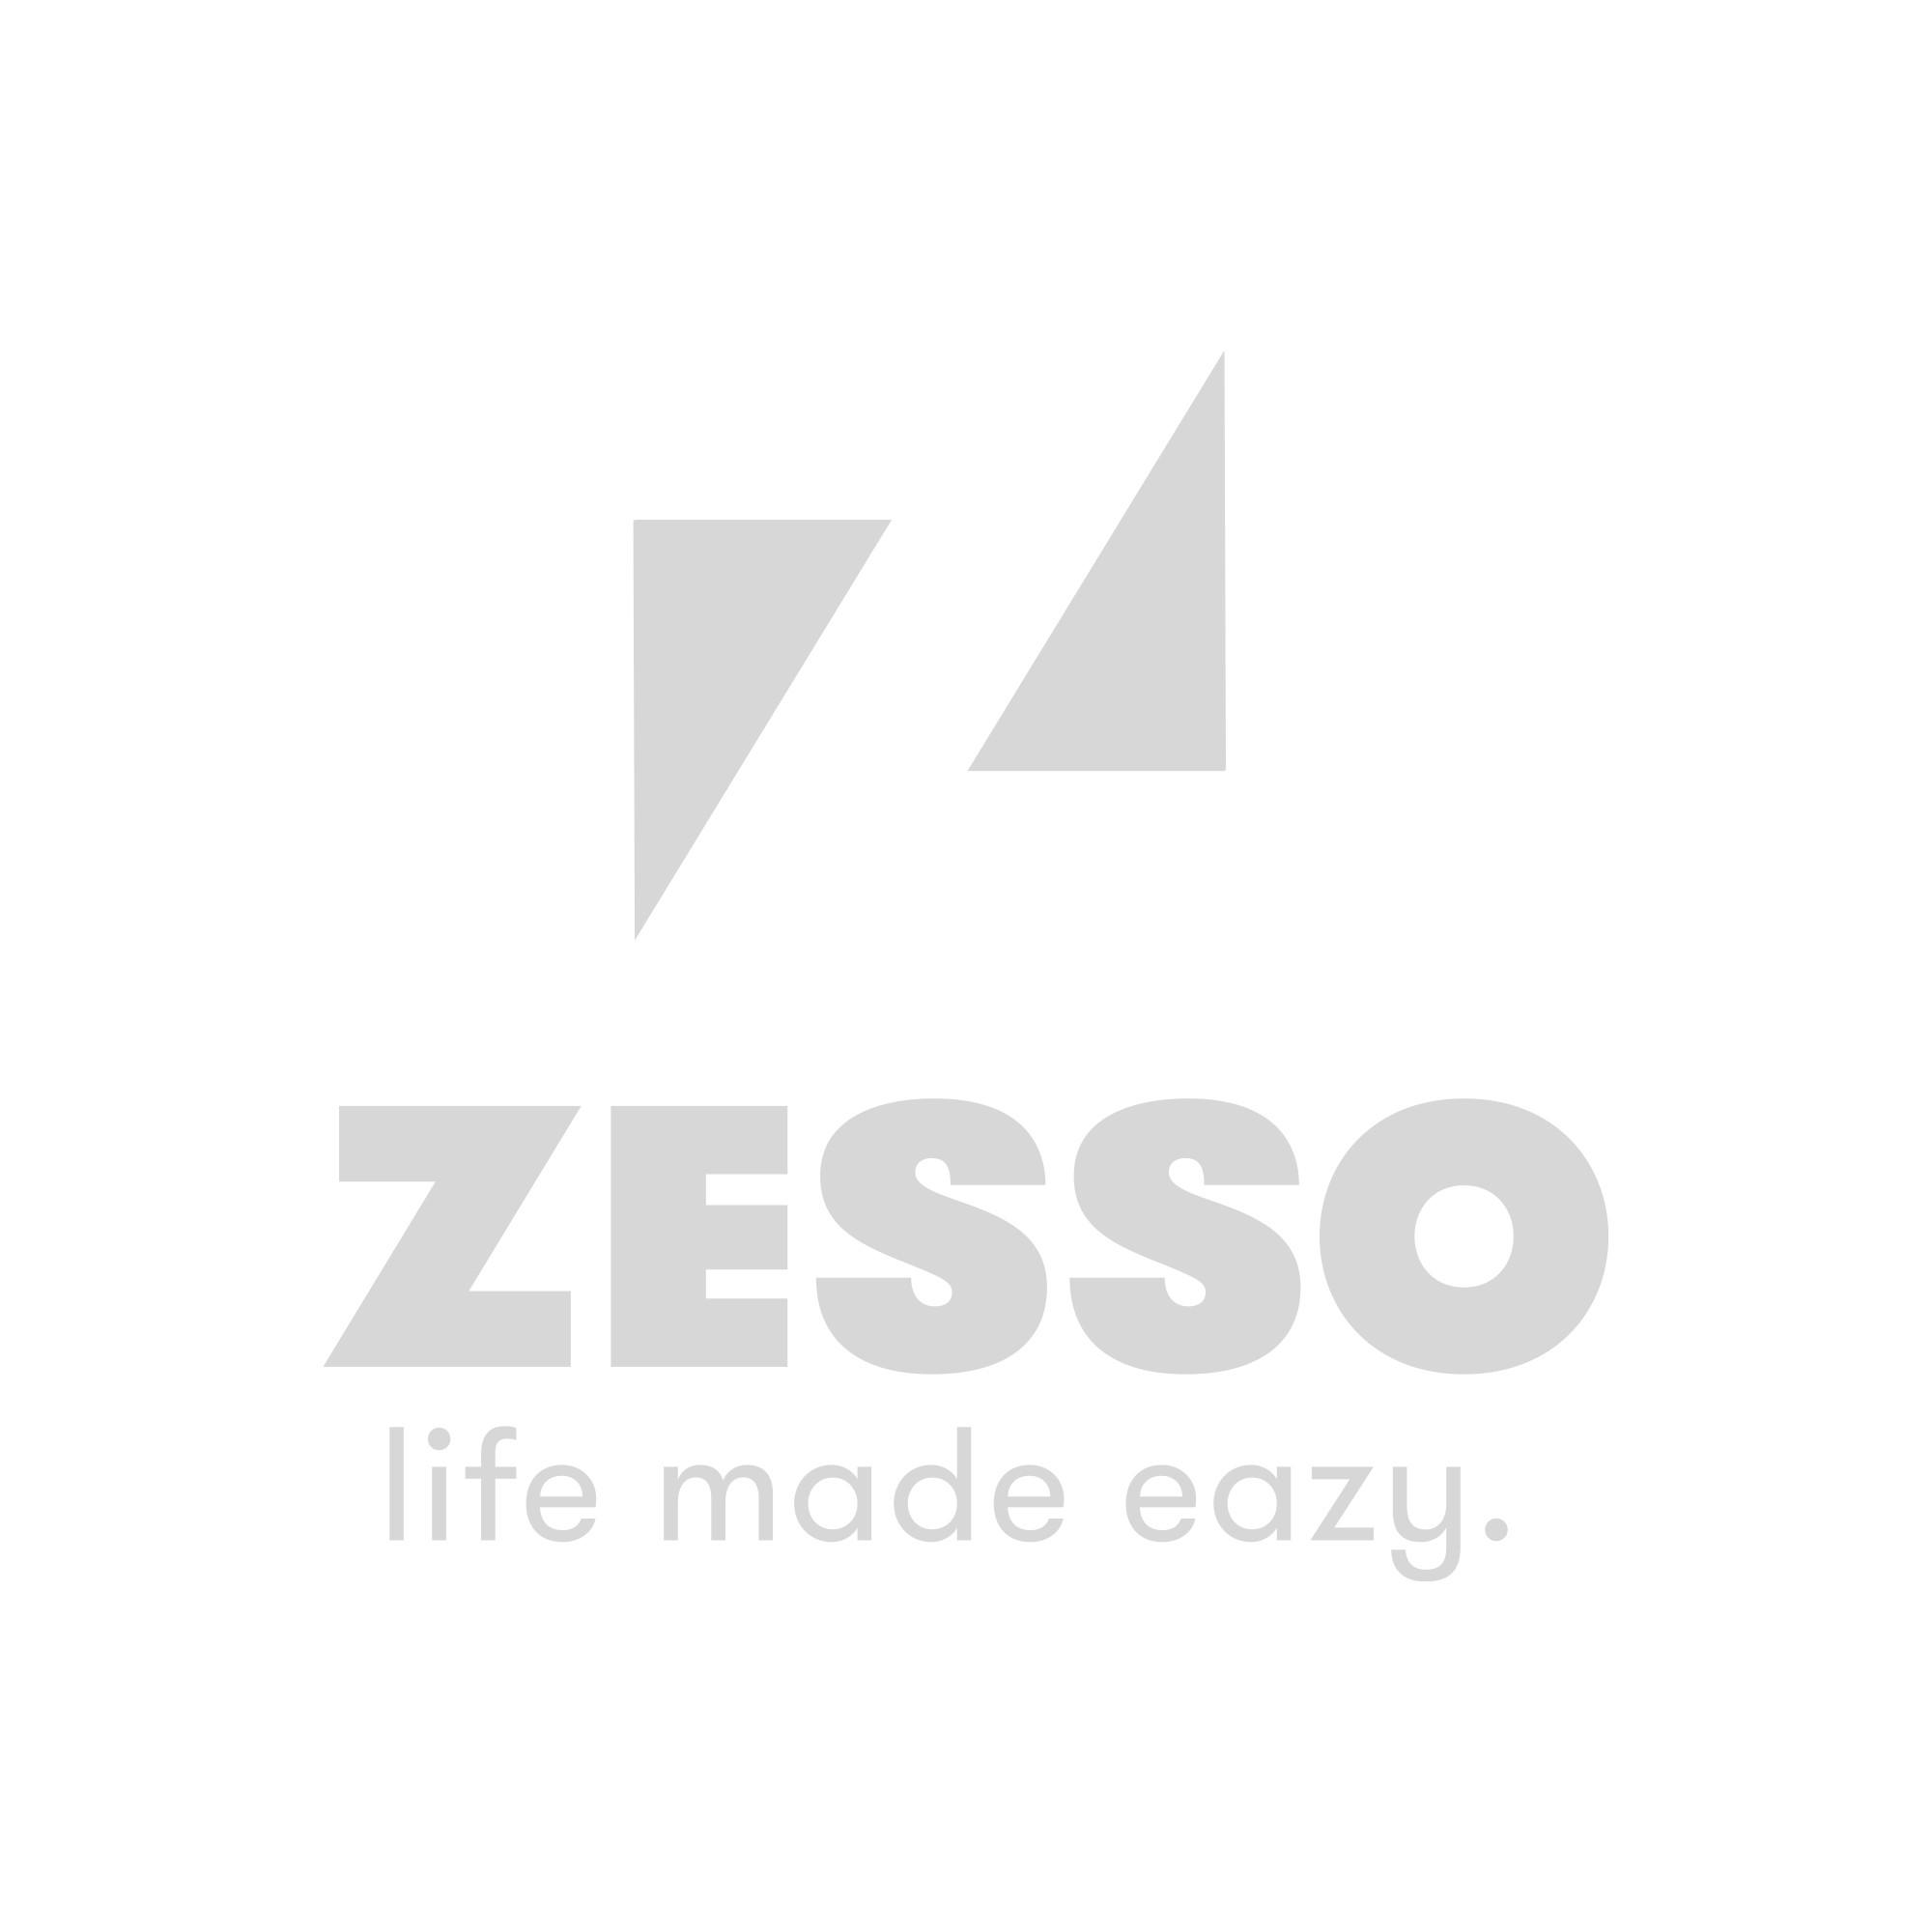 Yookidoo Badspeelgoed Jet Duck Create A Mermaid